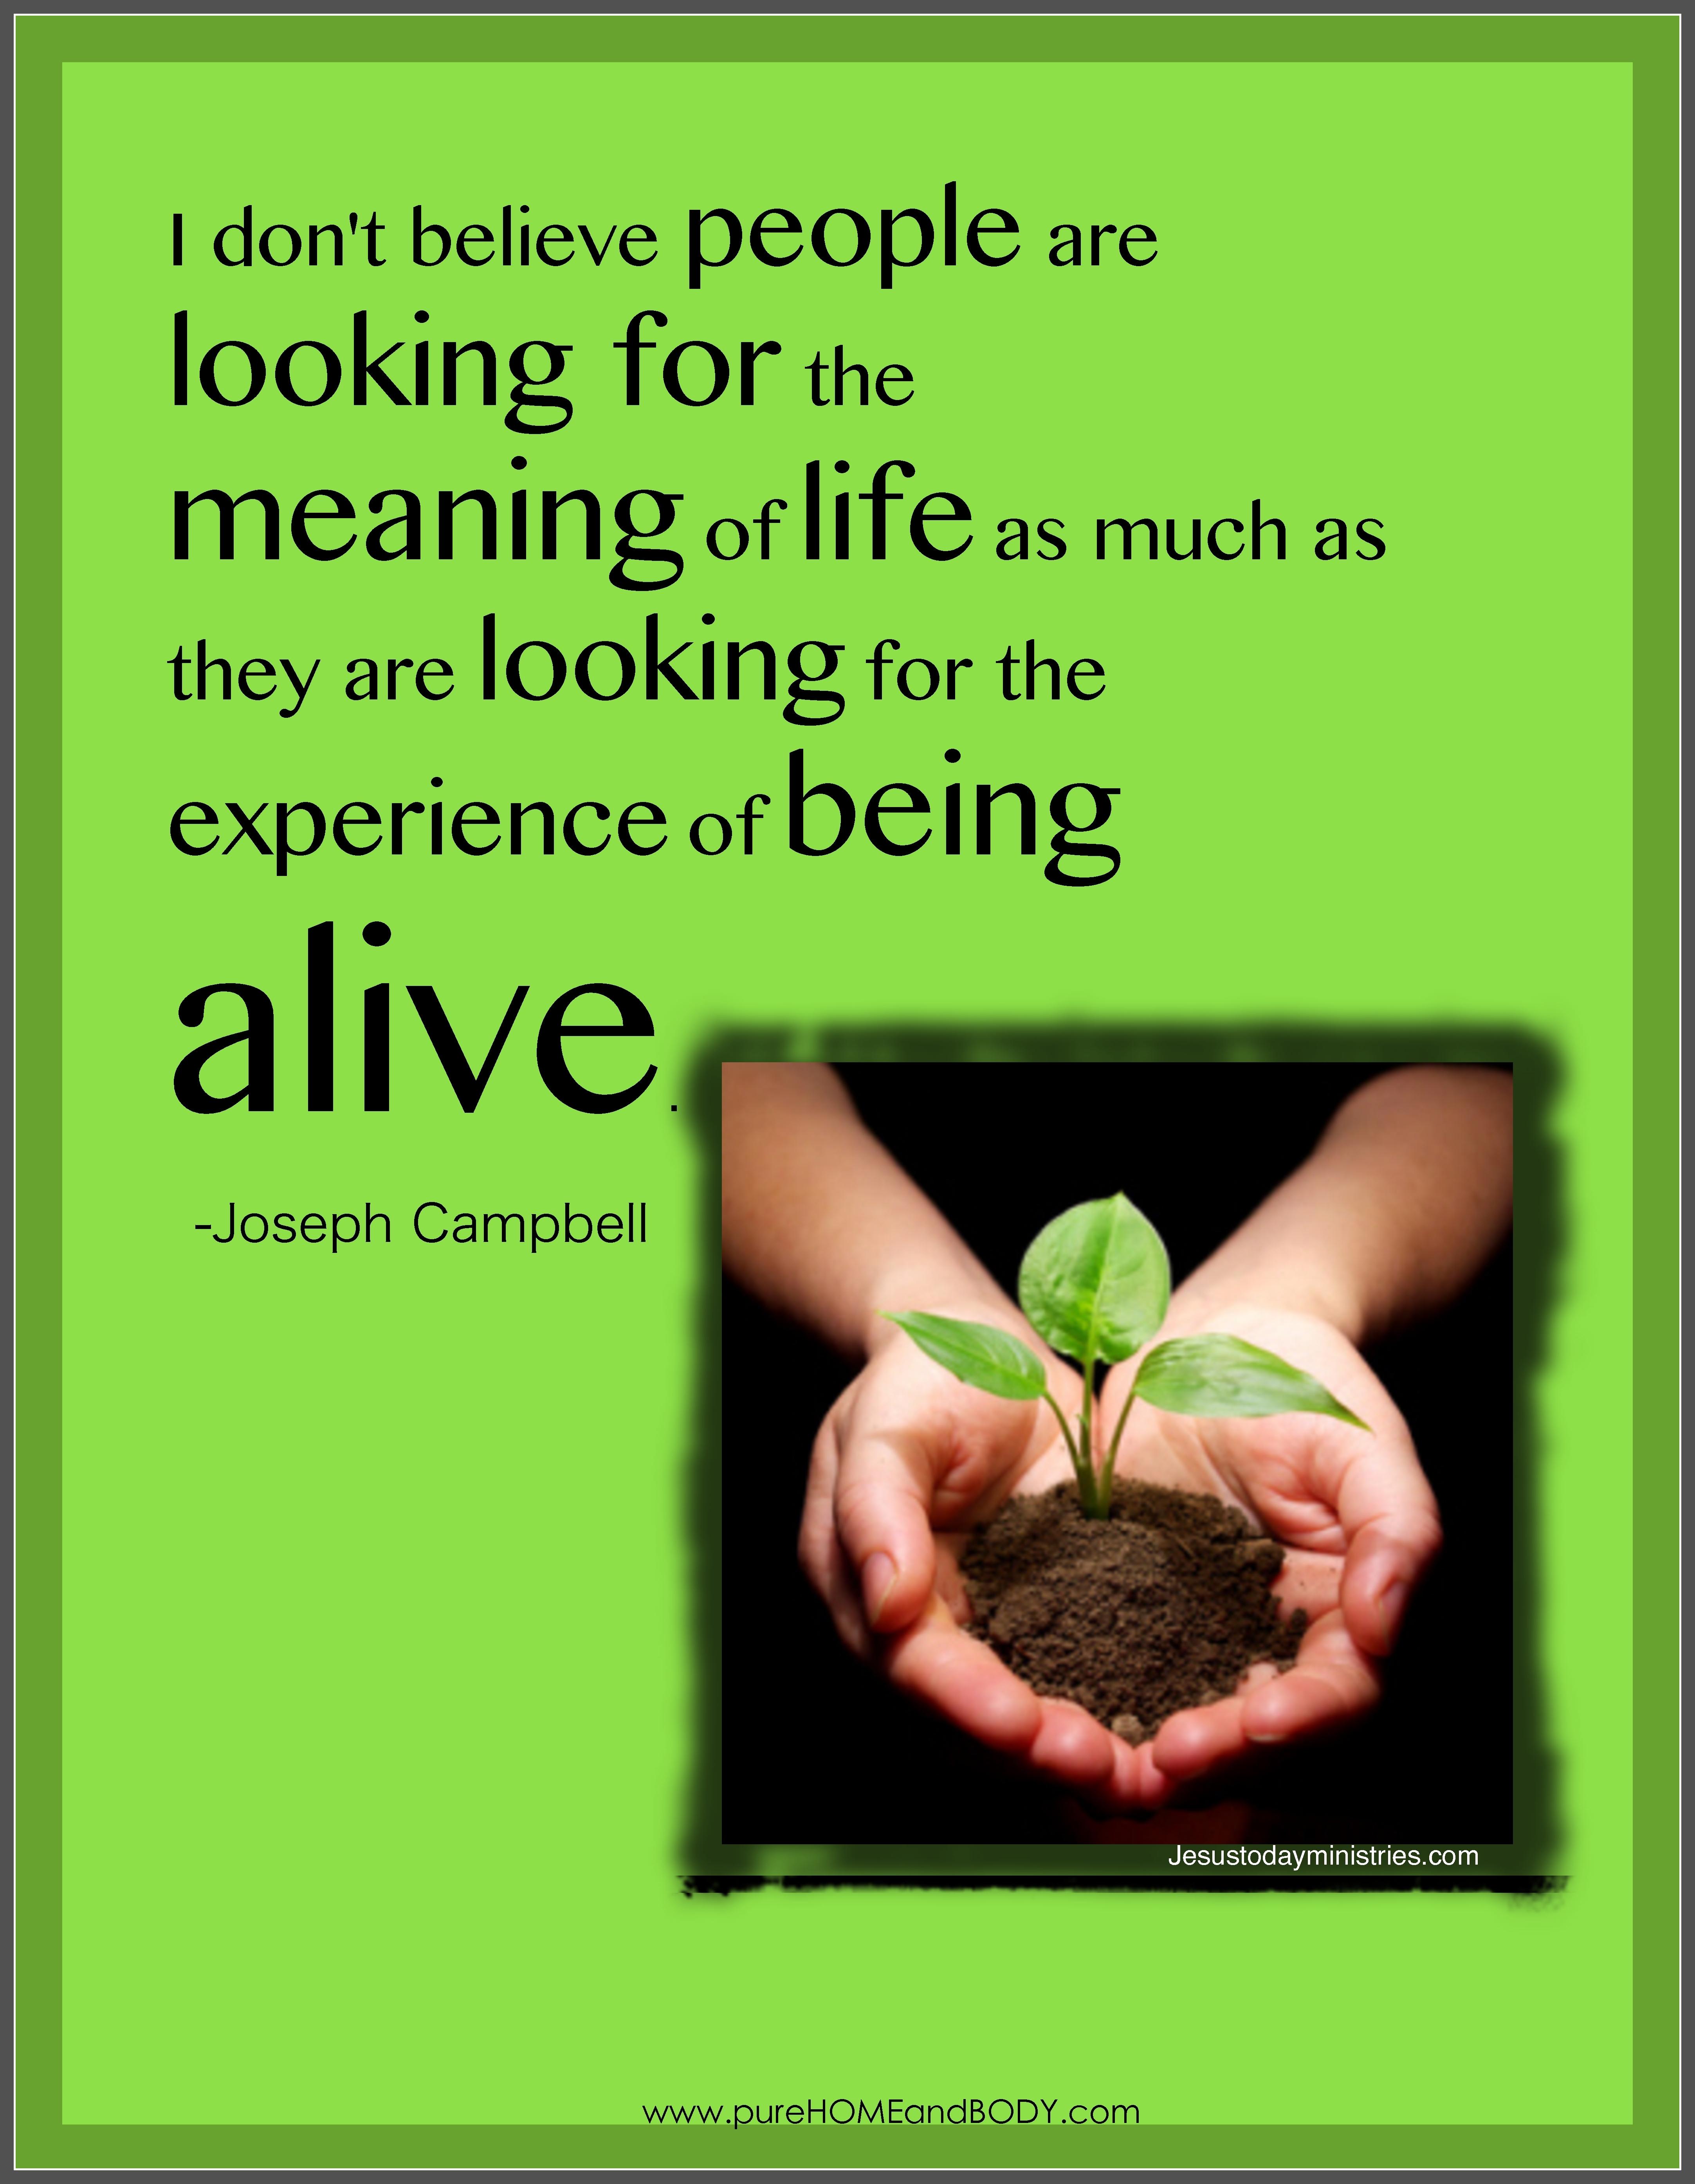 Joseph Campbell's quote #7